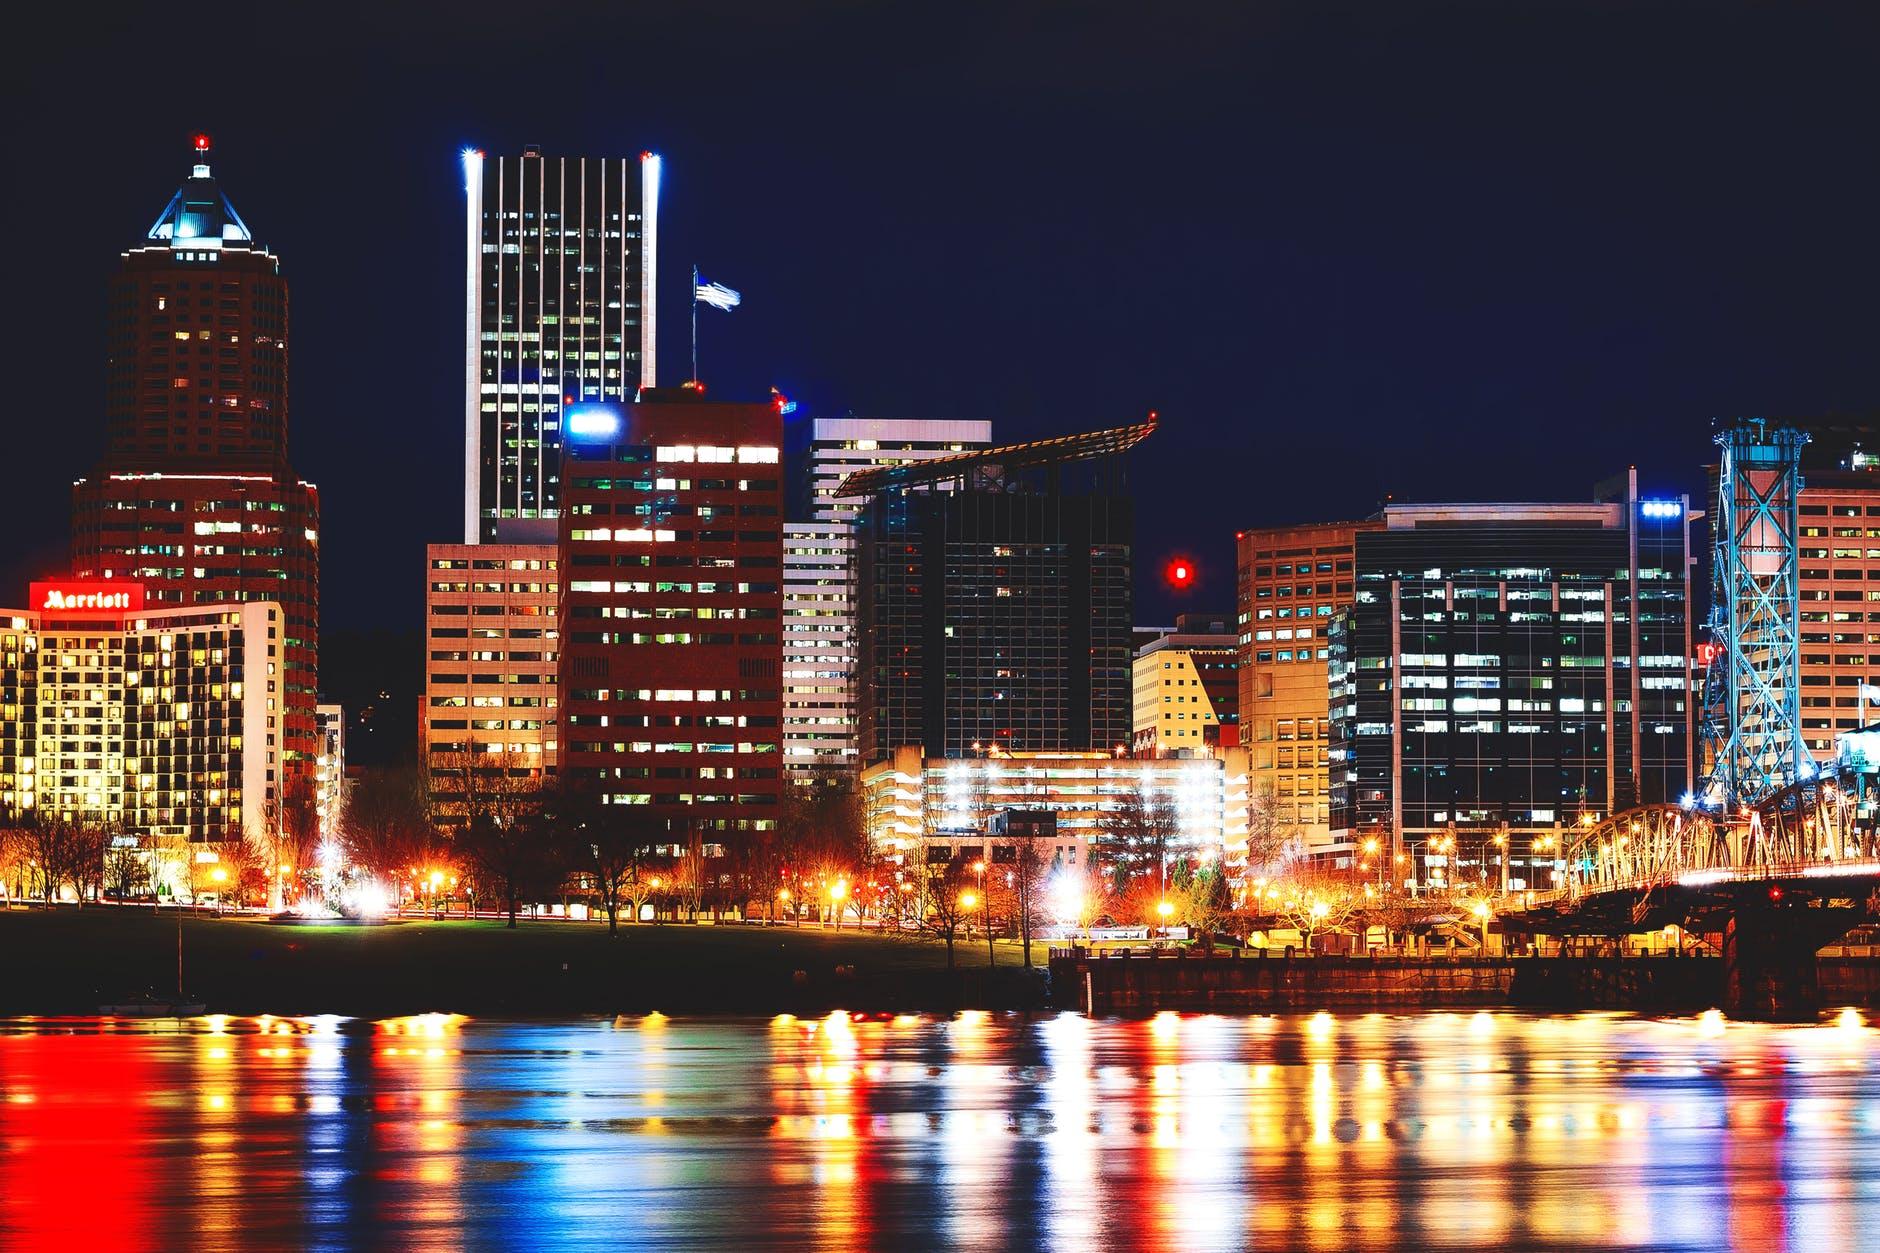 architecture buildings city city lights